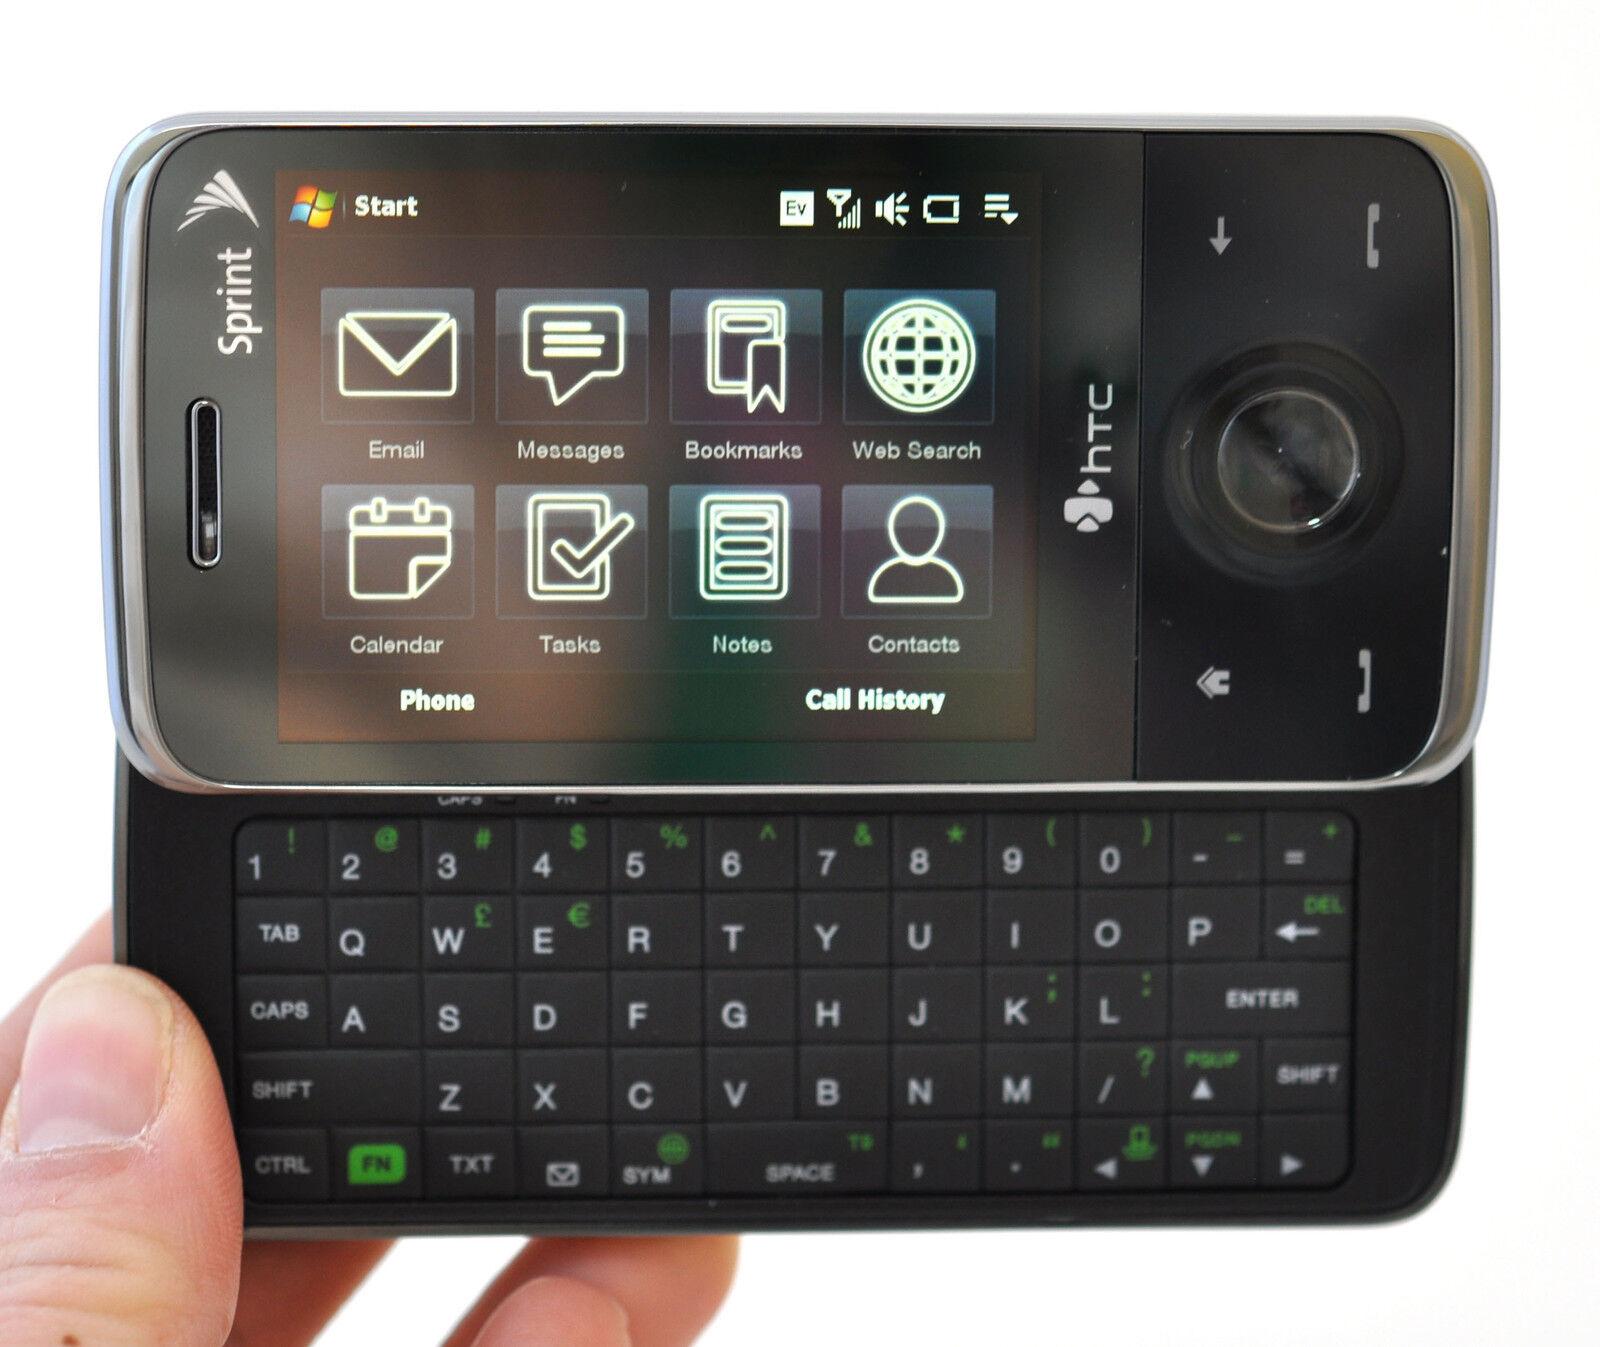 htc touch sprint manual daily instruction manual guides u2022 rh testingwordpress co Sprint HTC Palm Sprint HTC EVO Design 4G